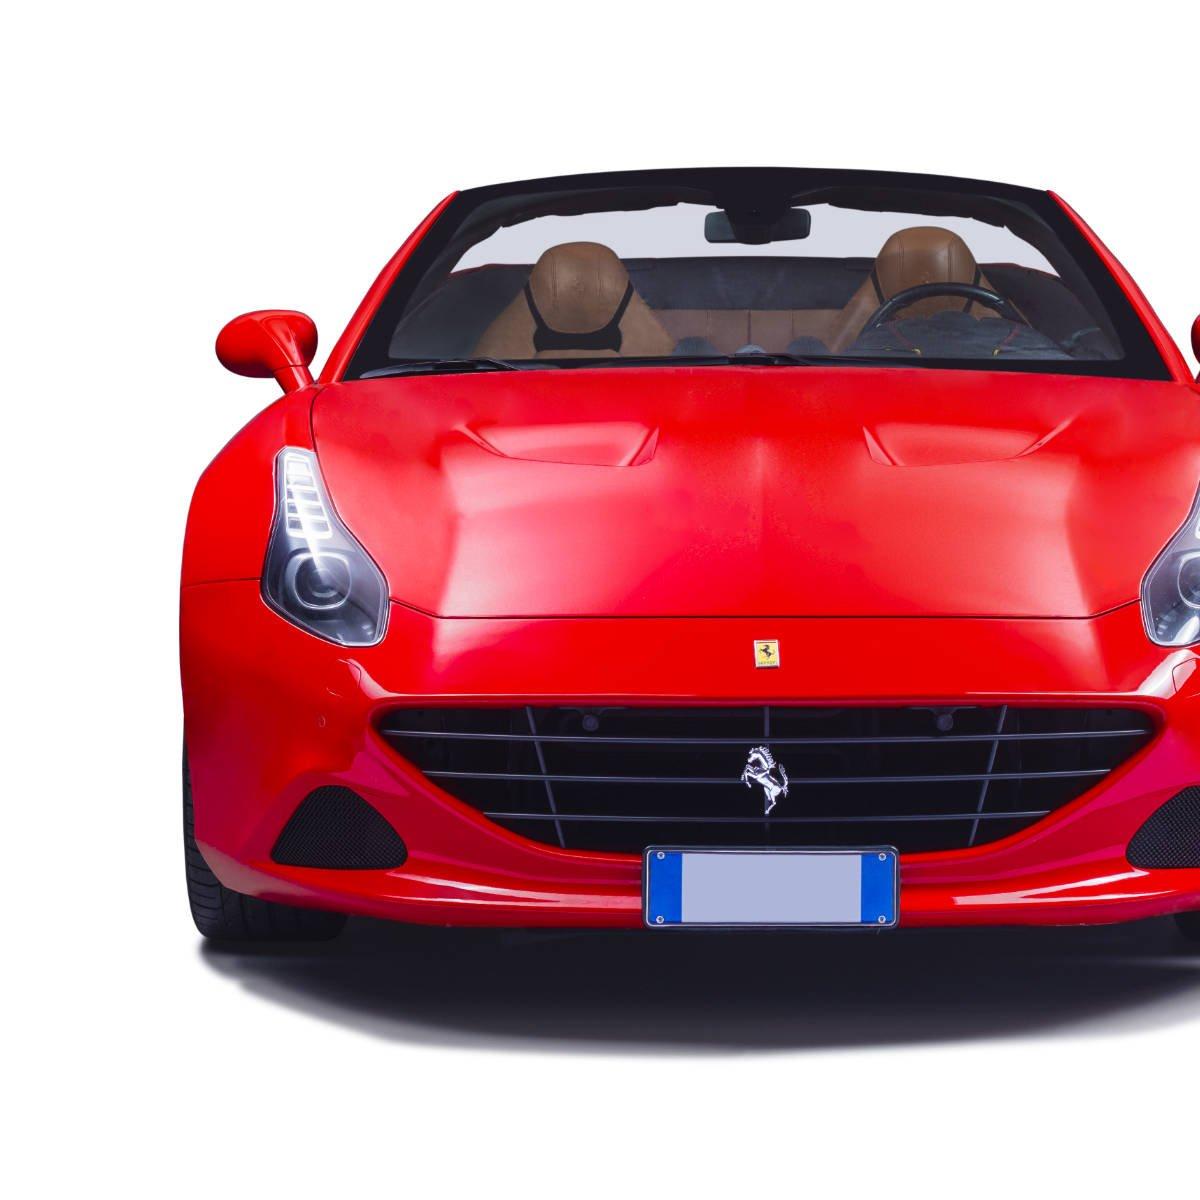 Ferrari 4 Seater: Test Drive Ferrari California T (4 Seats)